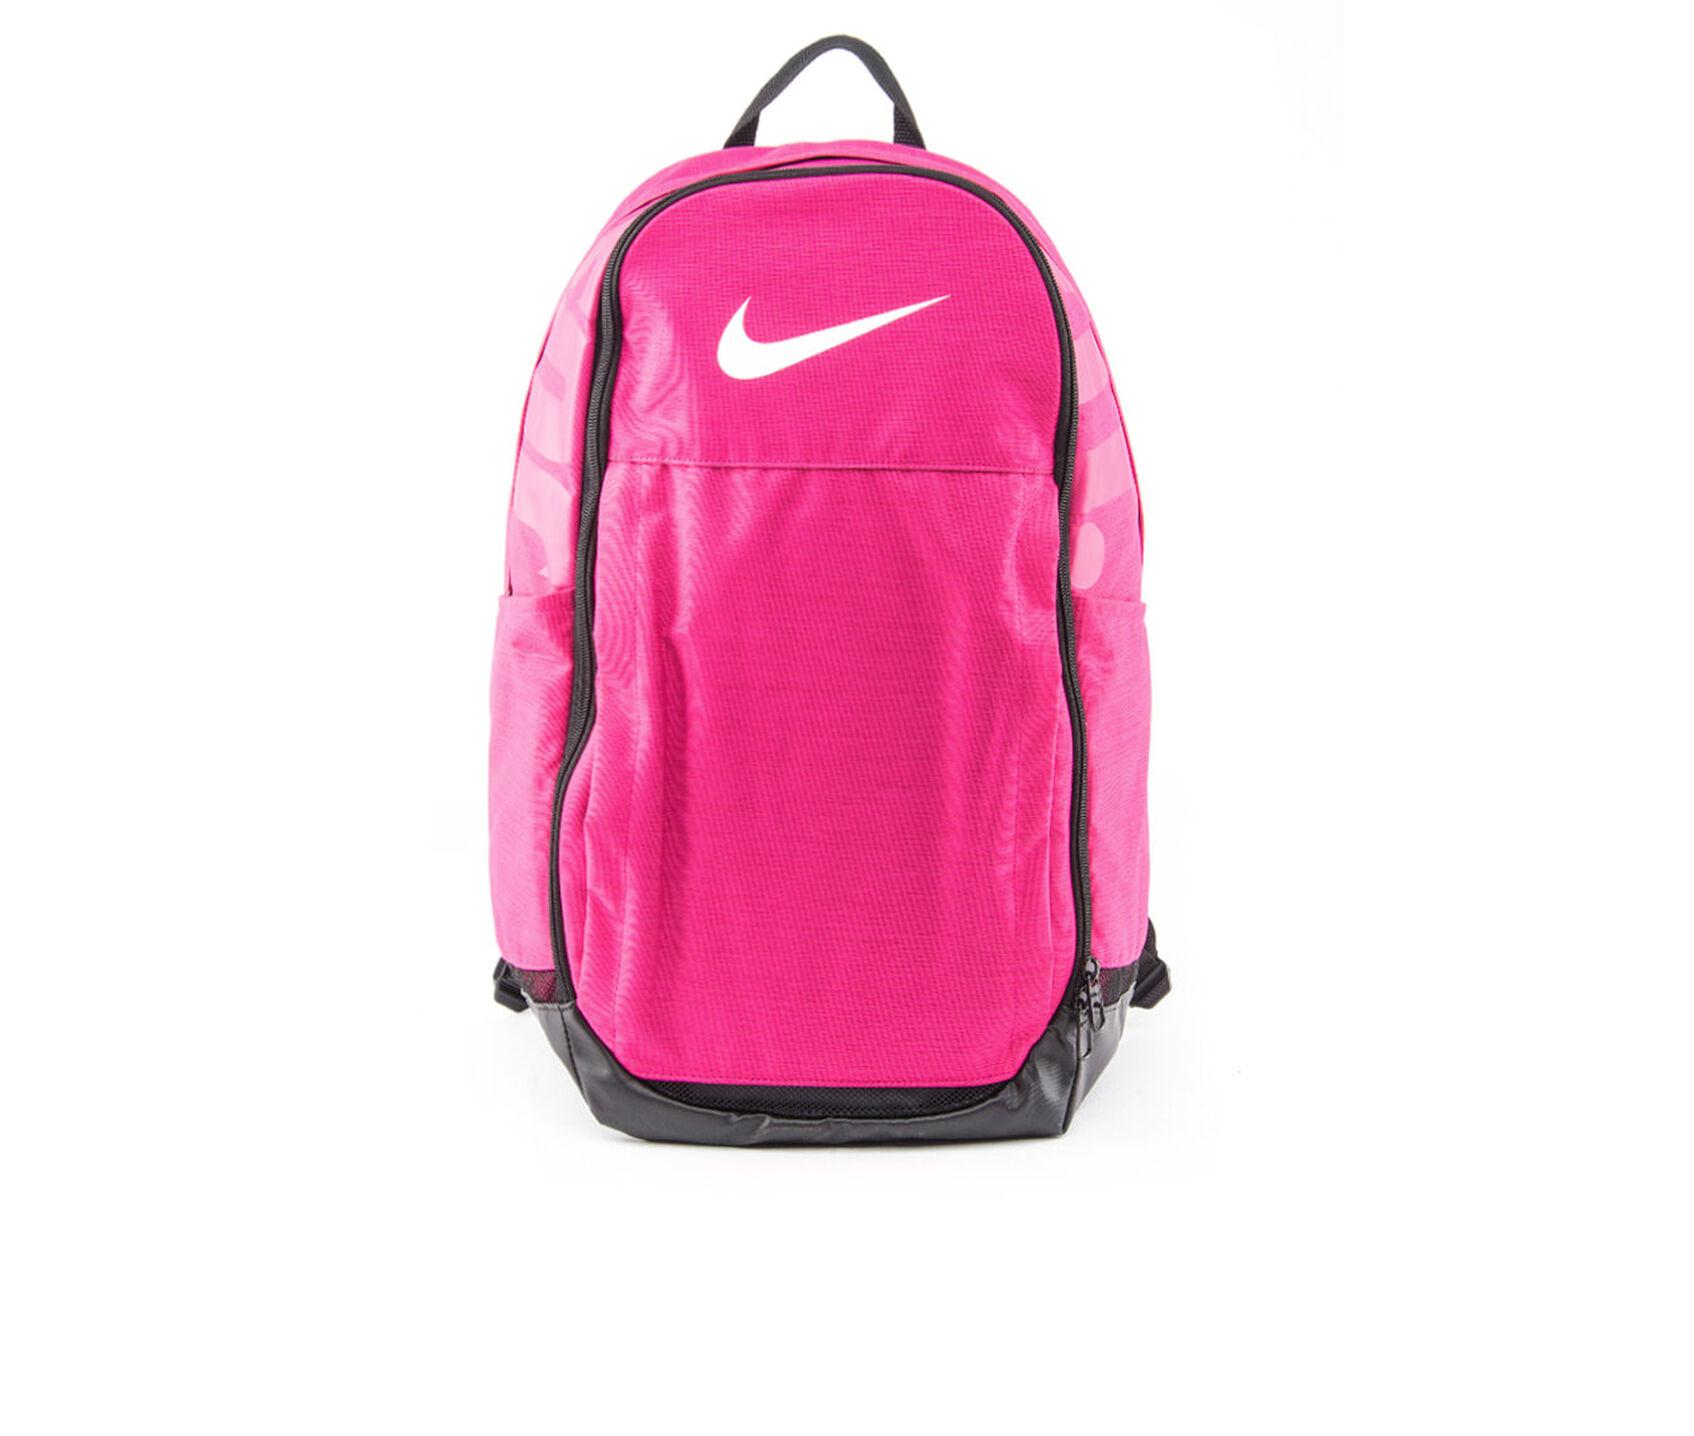 4a1a2a3d3bc33 Nike Brasilia 7 Backpack XL | Shoe Carnival